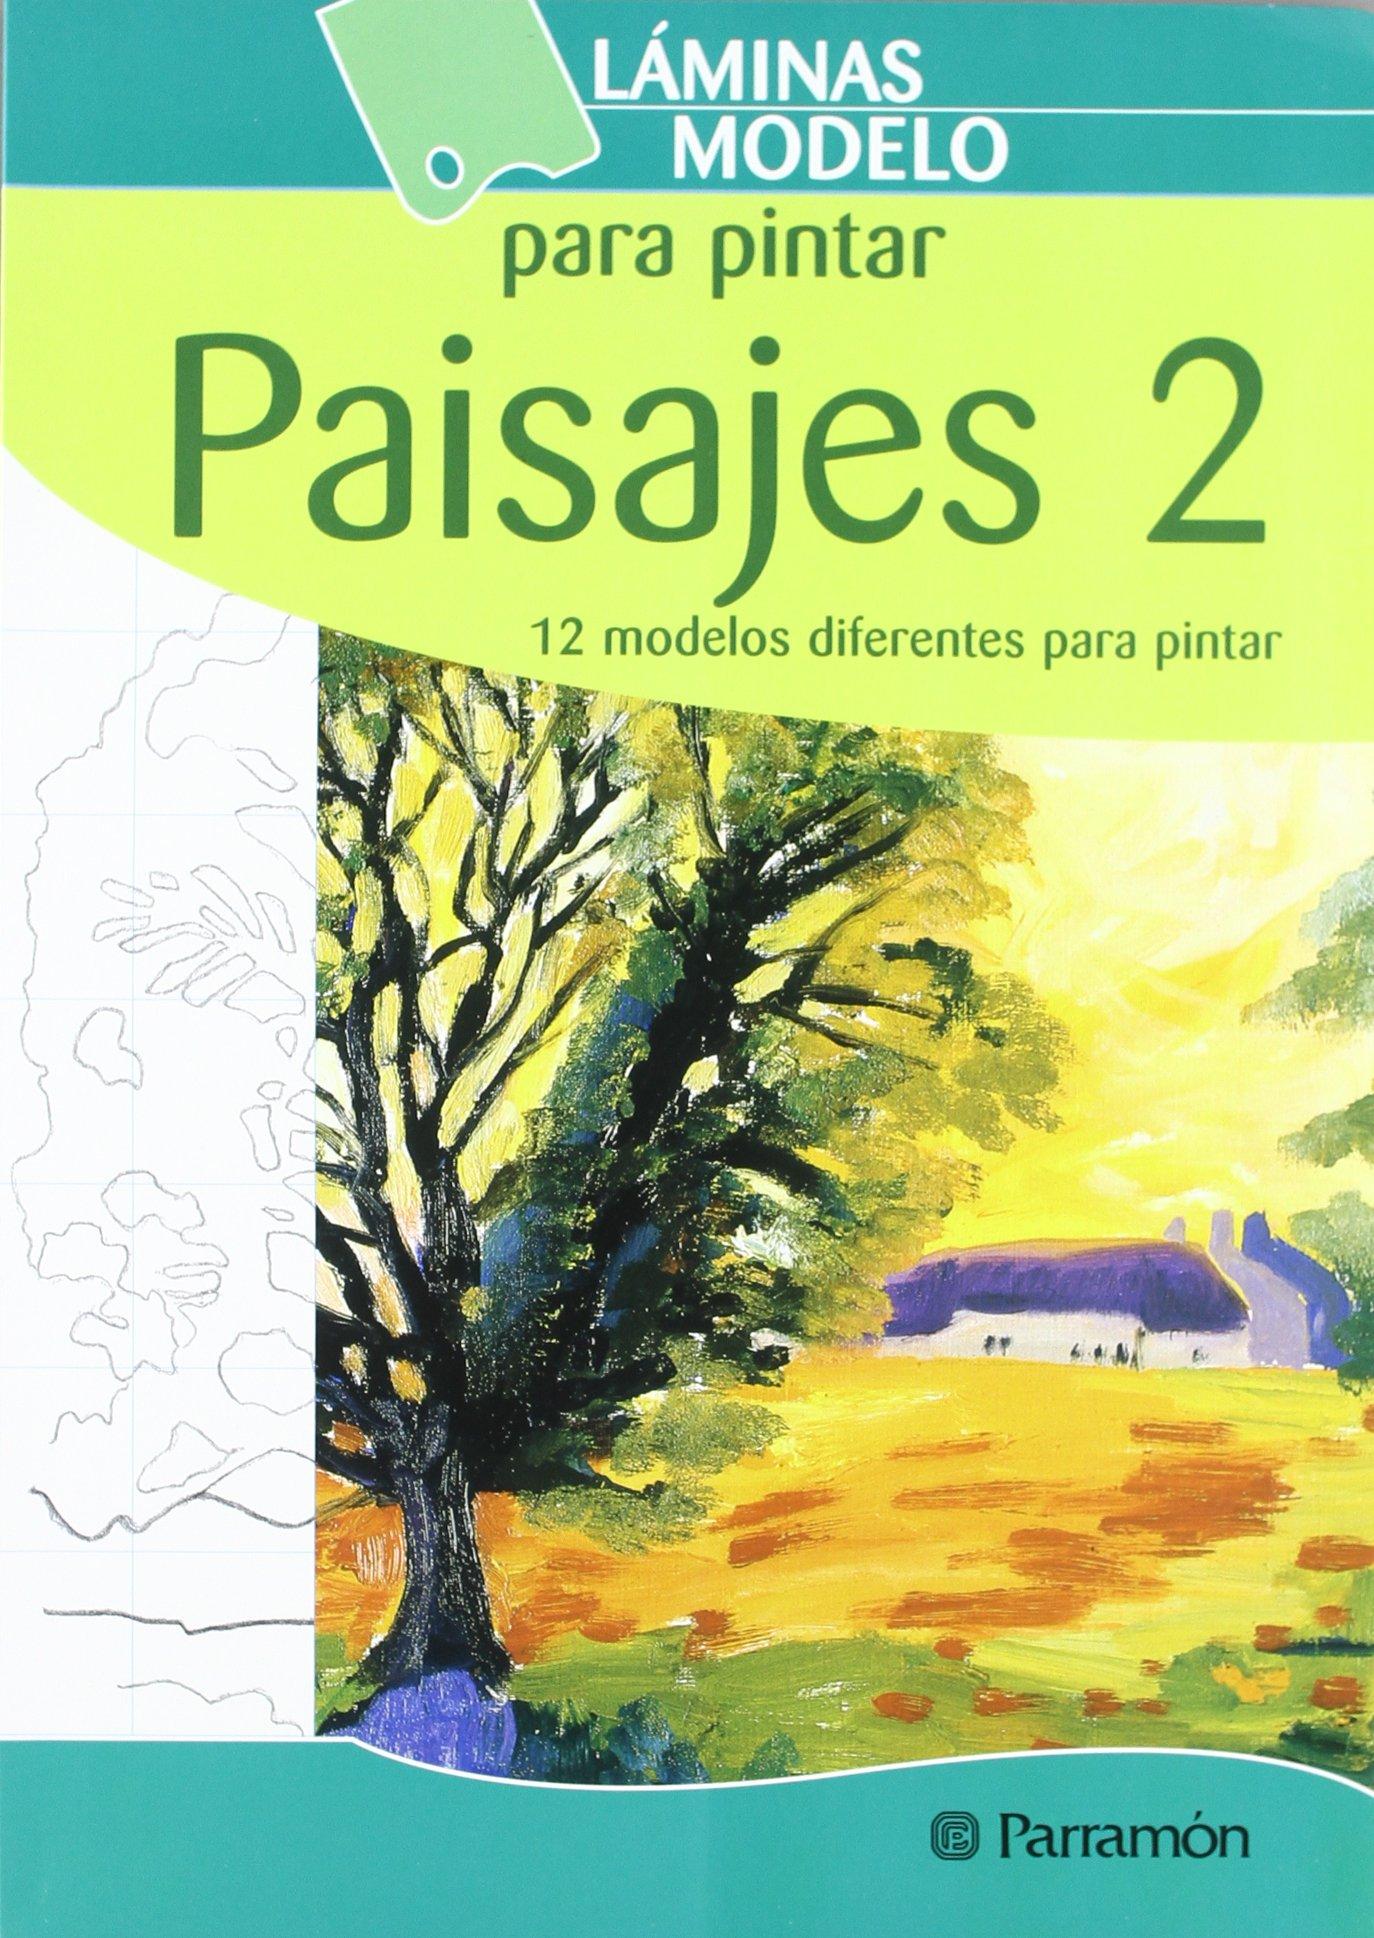 Laminas Modelo Para Pintar Paisajes 2 Láminas Modelo Para Pintar Spanish Edition Parramon Equipo 9788434229976 Books